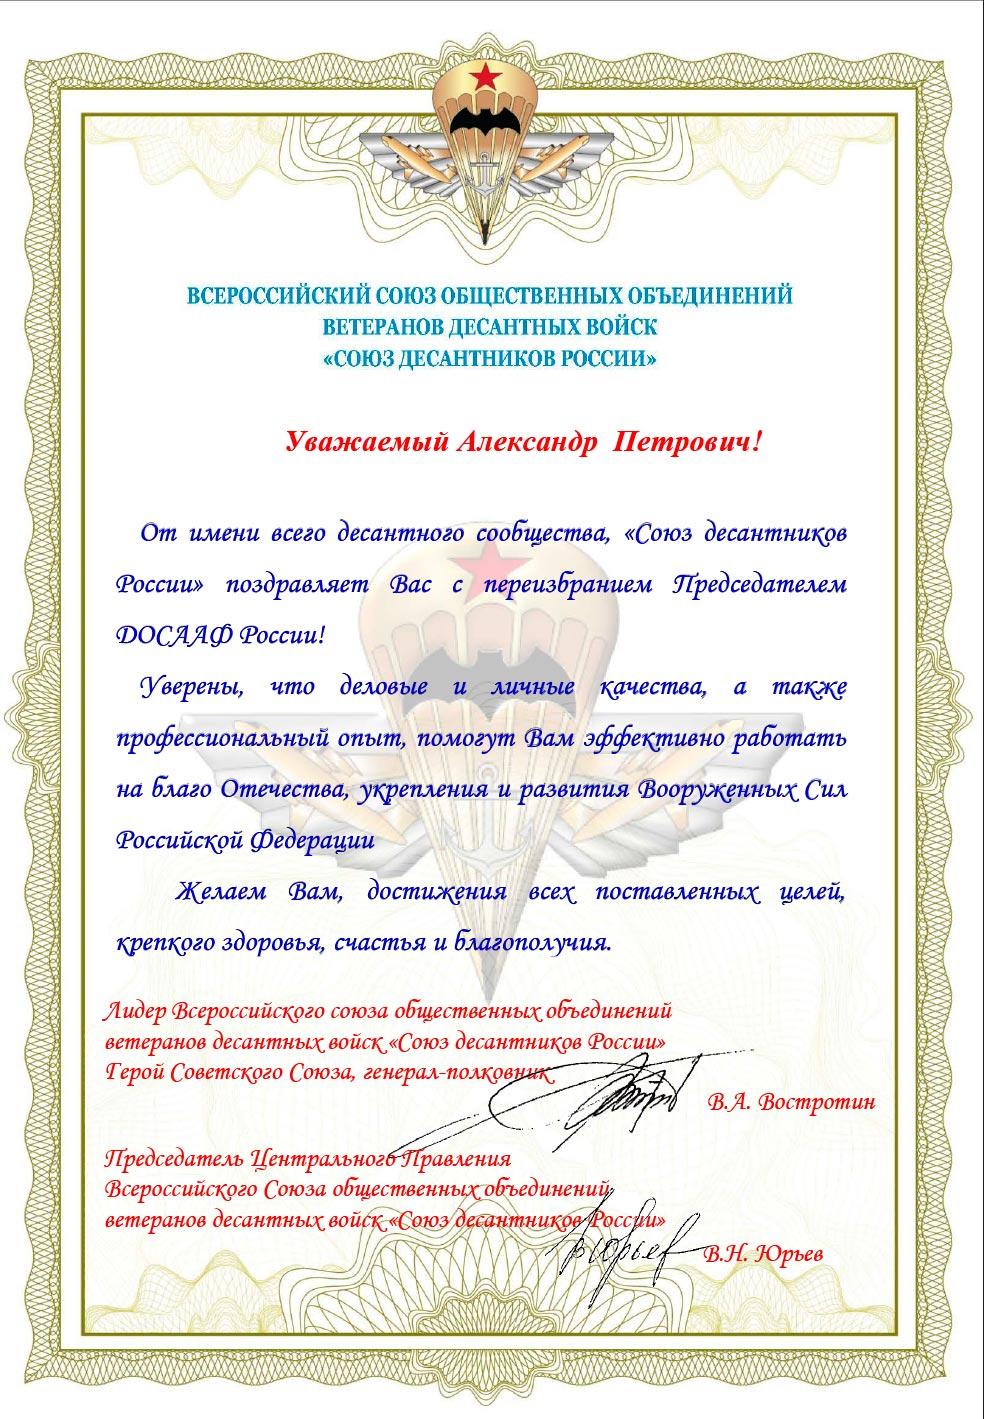 ПОЗДРАВЛЯЕМ Генерал-полковника КОЛМАКОВА АЛЕКСАНДРА ПЕТРОВИЧА!